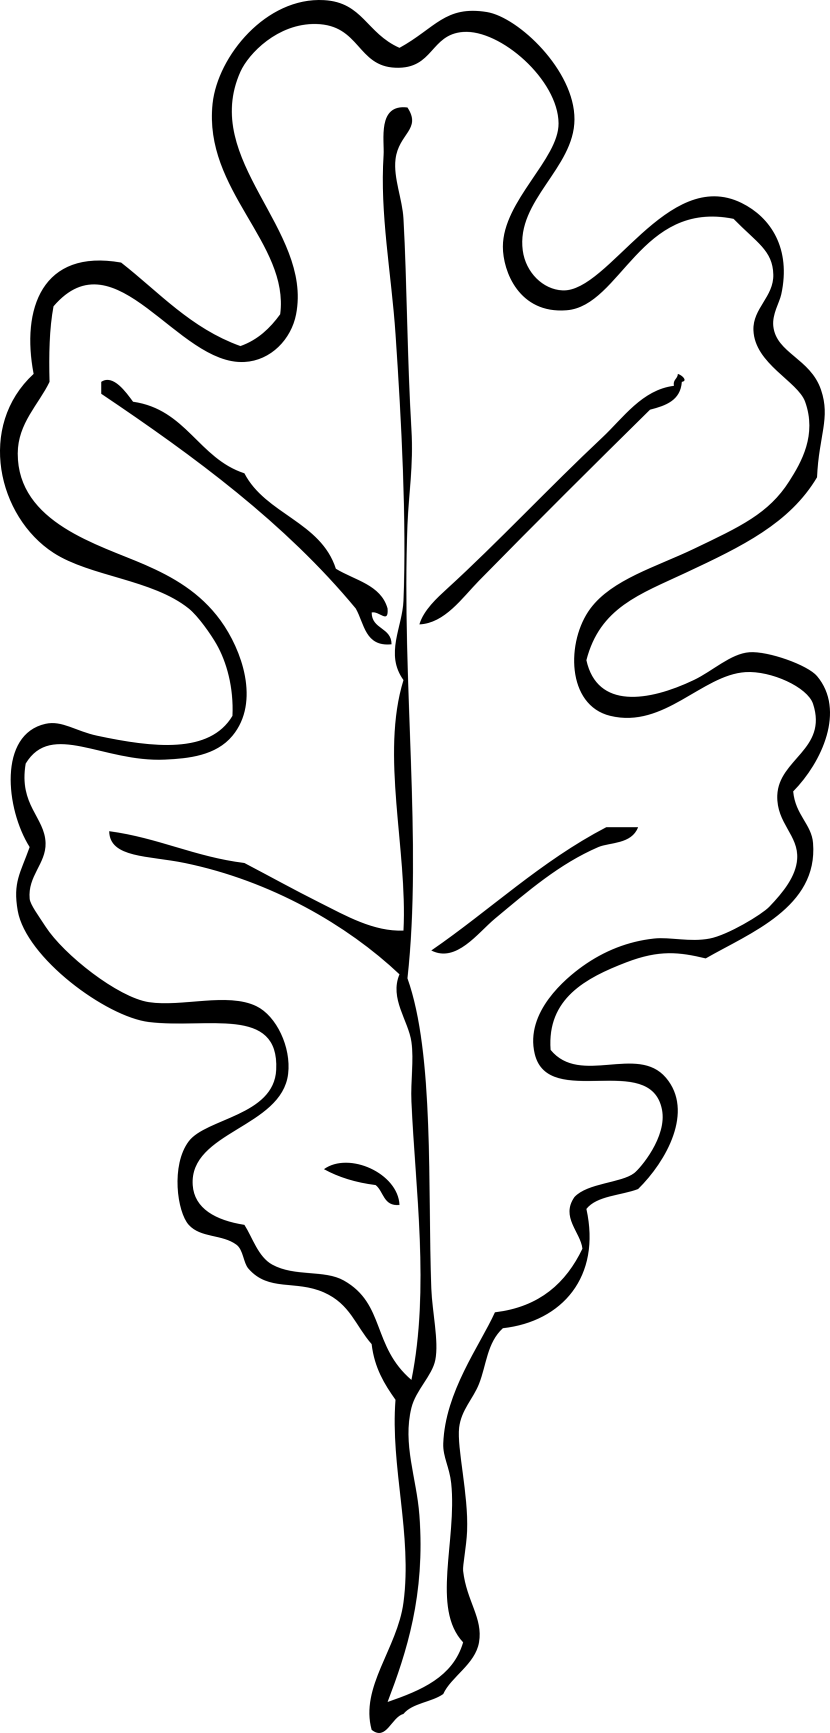 830x1733 Leaf Black And White Fall Leaves Clip Art Black And White 5